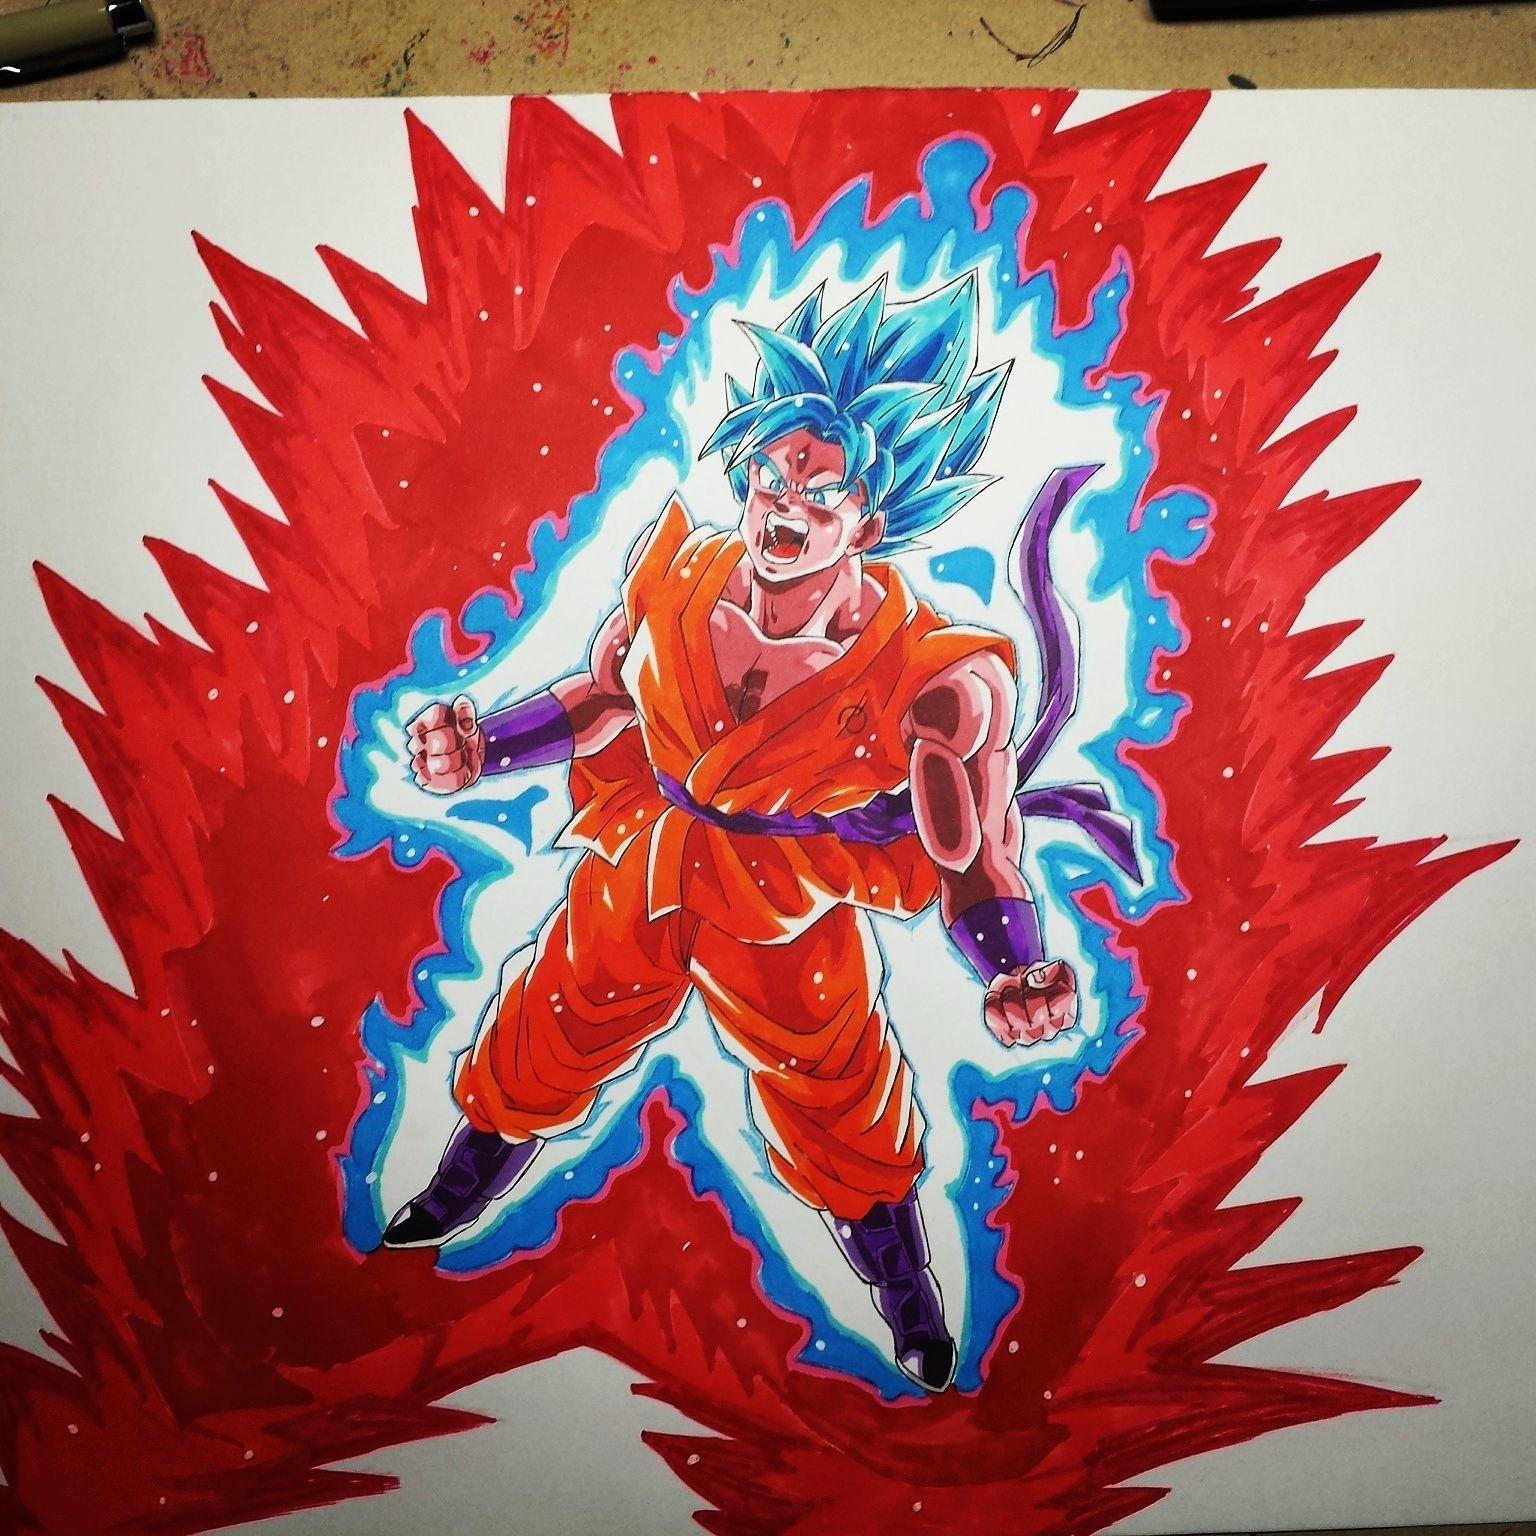 Goku Ssgss Kaioken X10 Goku Dragon Ball Super Dragon Ball